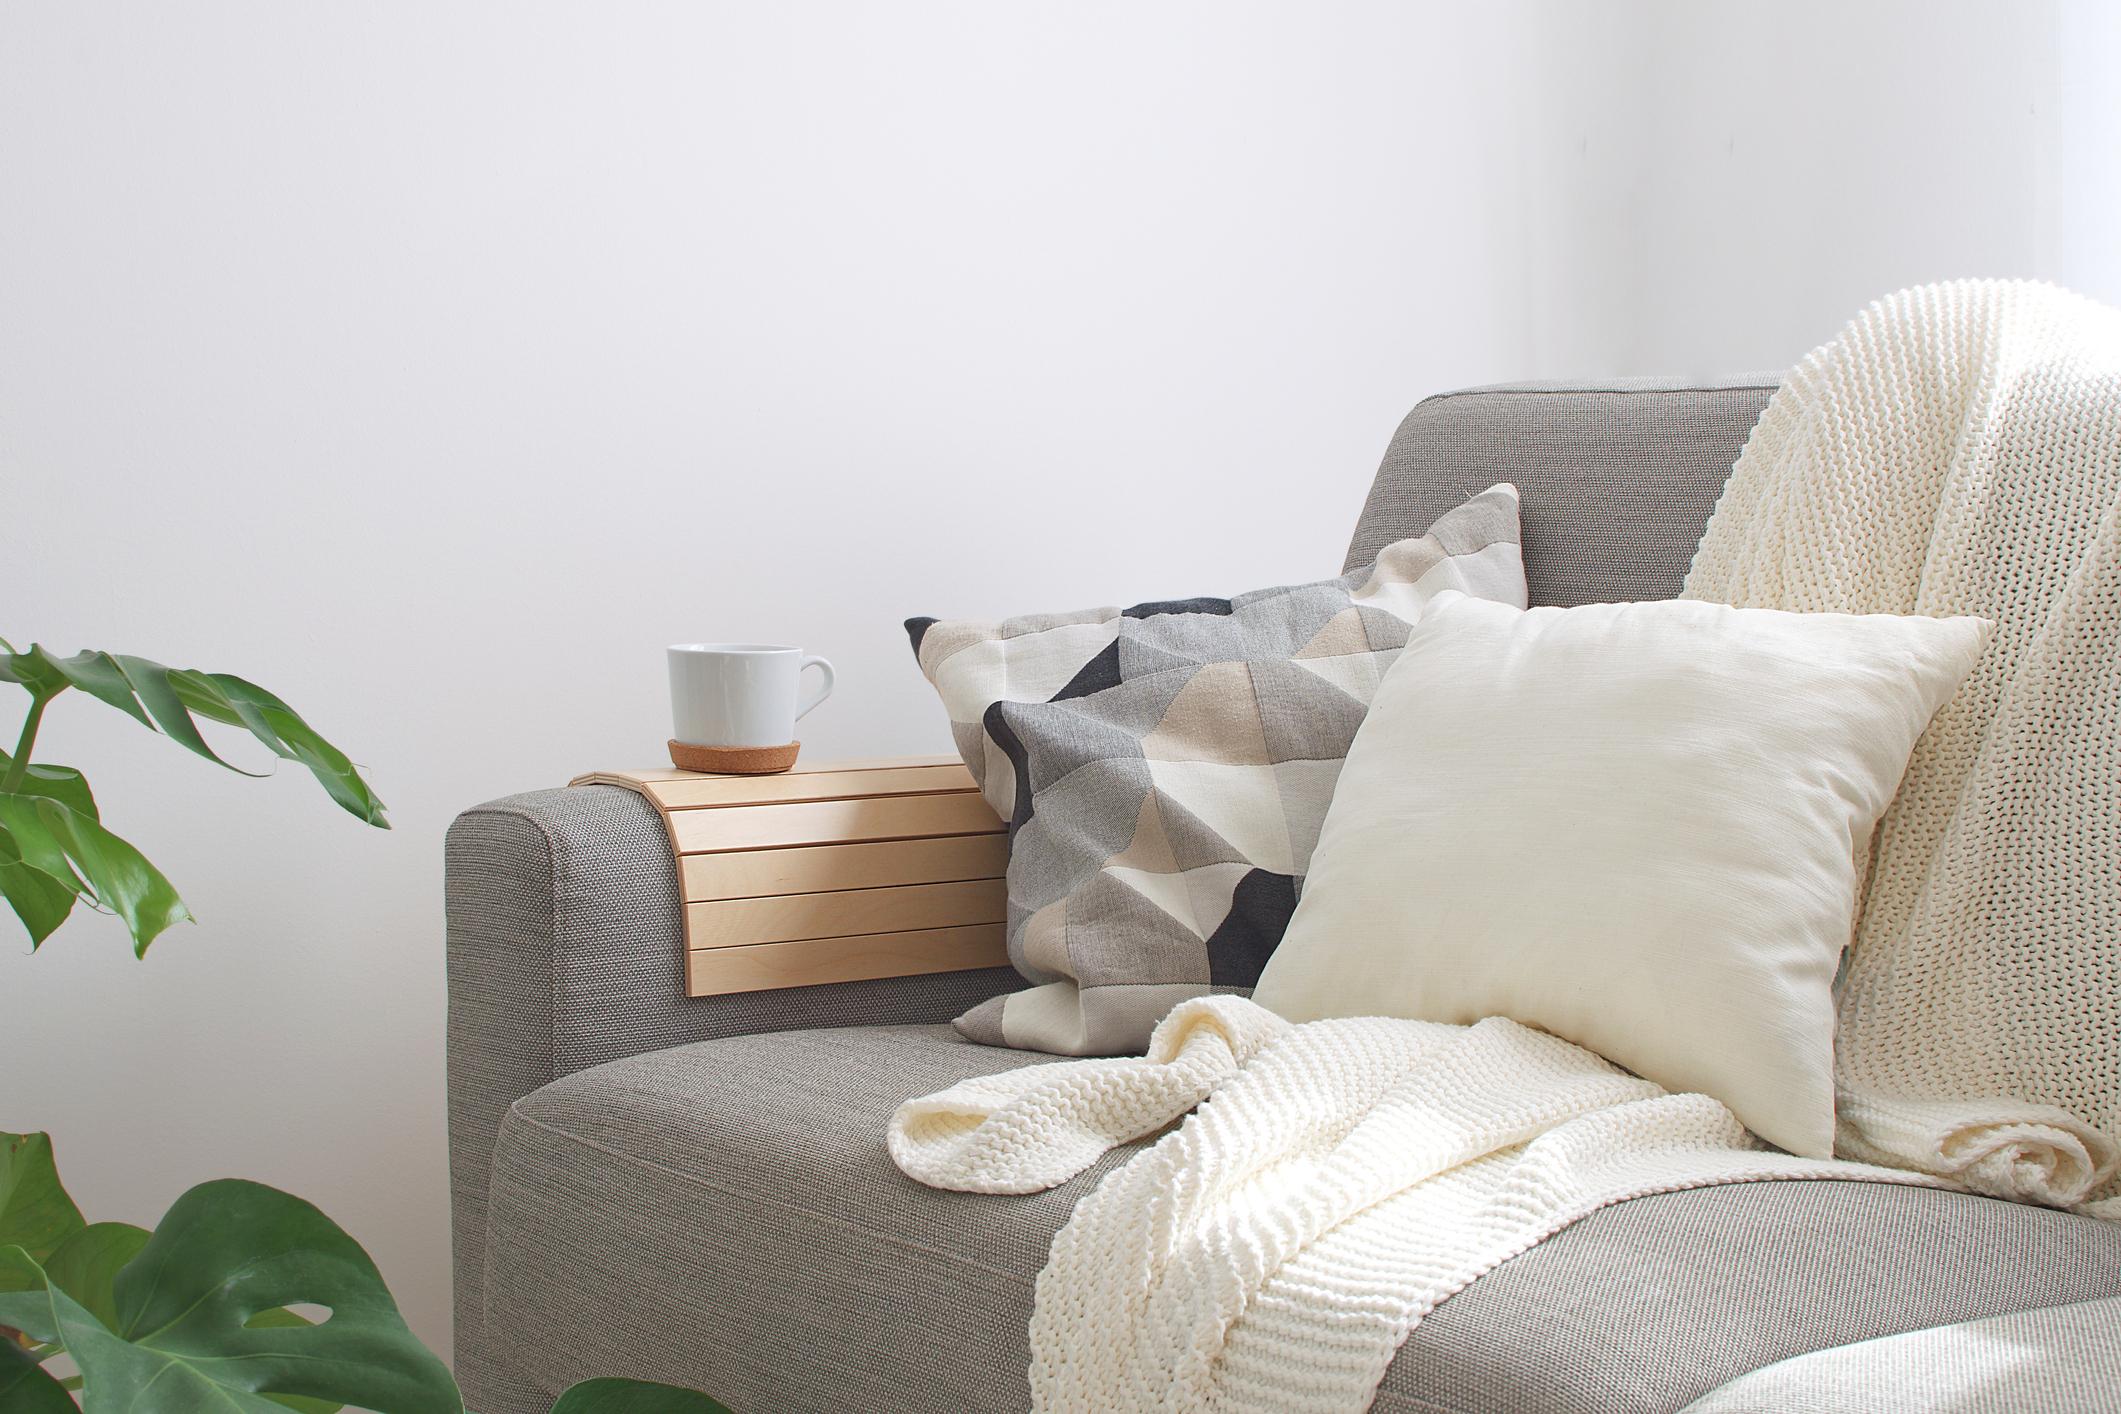 Home interior Cozy Living room Sofa Cushion Coffee mug Knitted plaid Monstera plant Room decor Scandinavian style Copy space